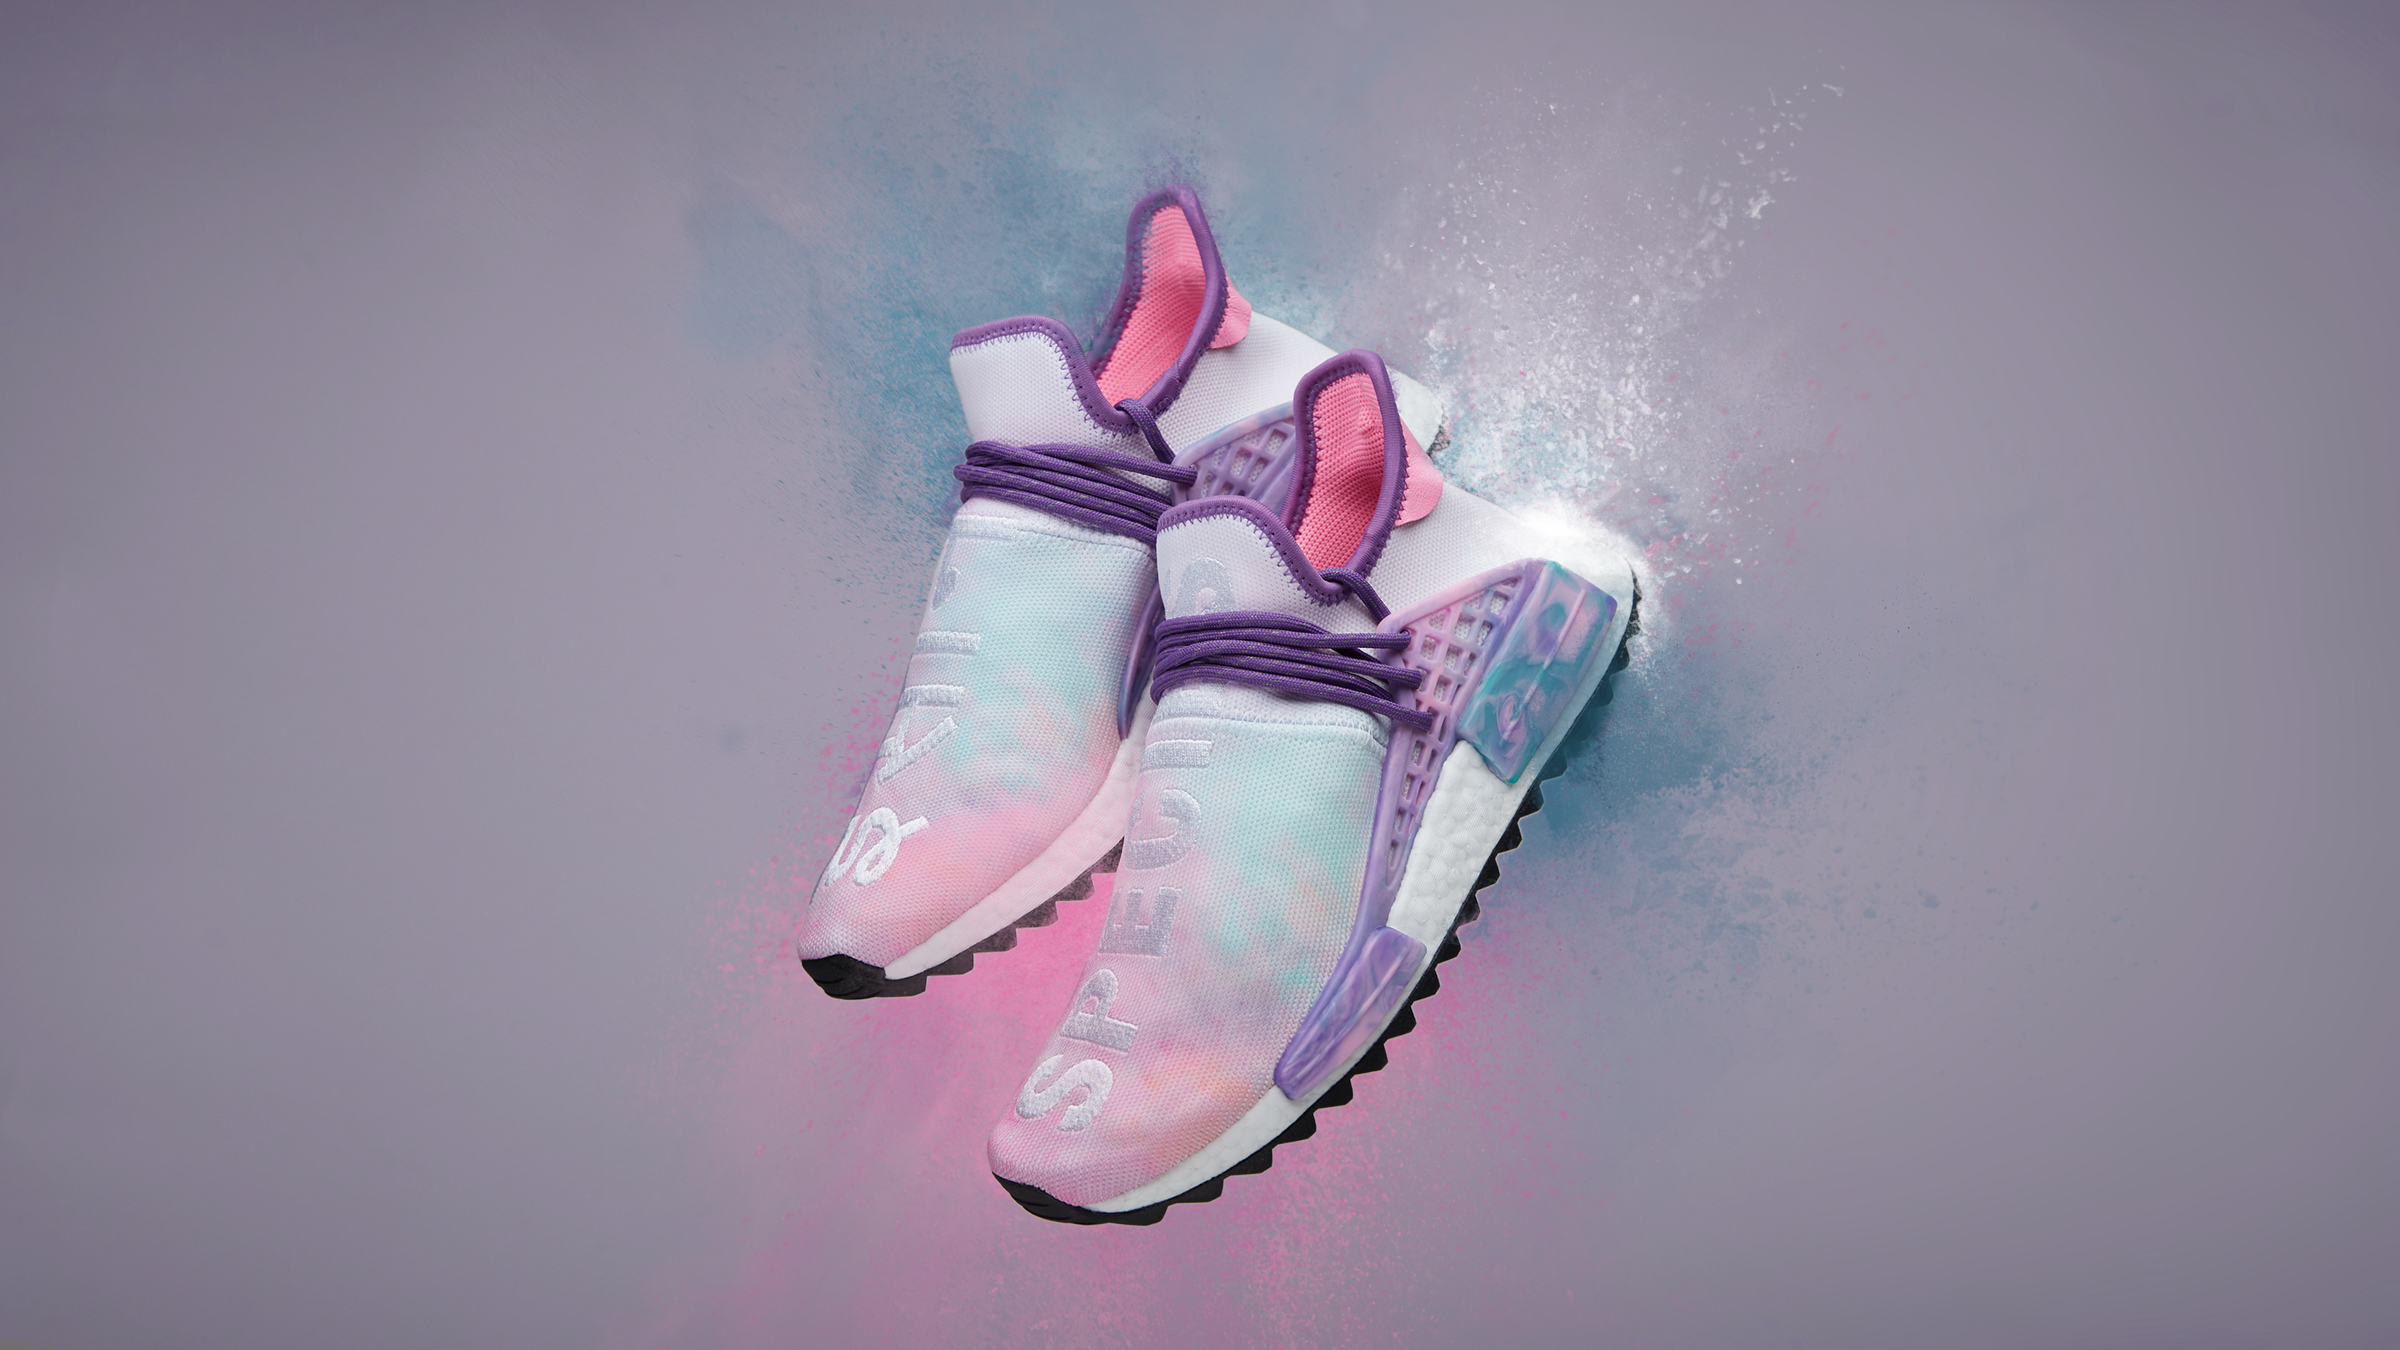 01c2b8157de246 Adidas-Originals-x-Pharrell-Williams-HU-Holi -NMD-Trail-MC-Pink-Glow-Powder-Dye-1